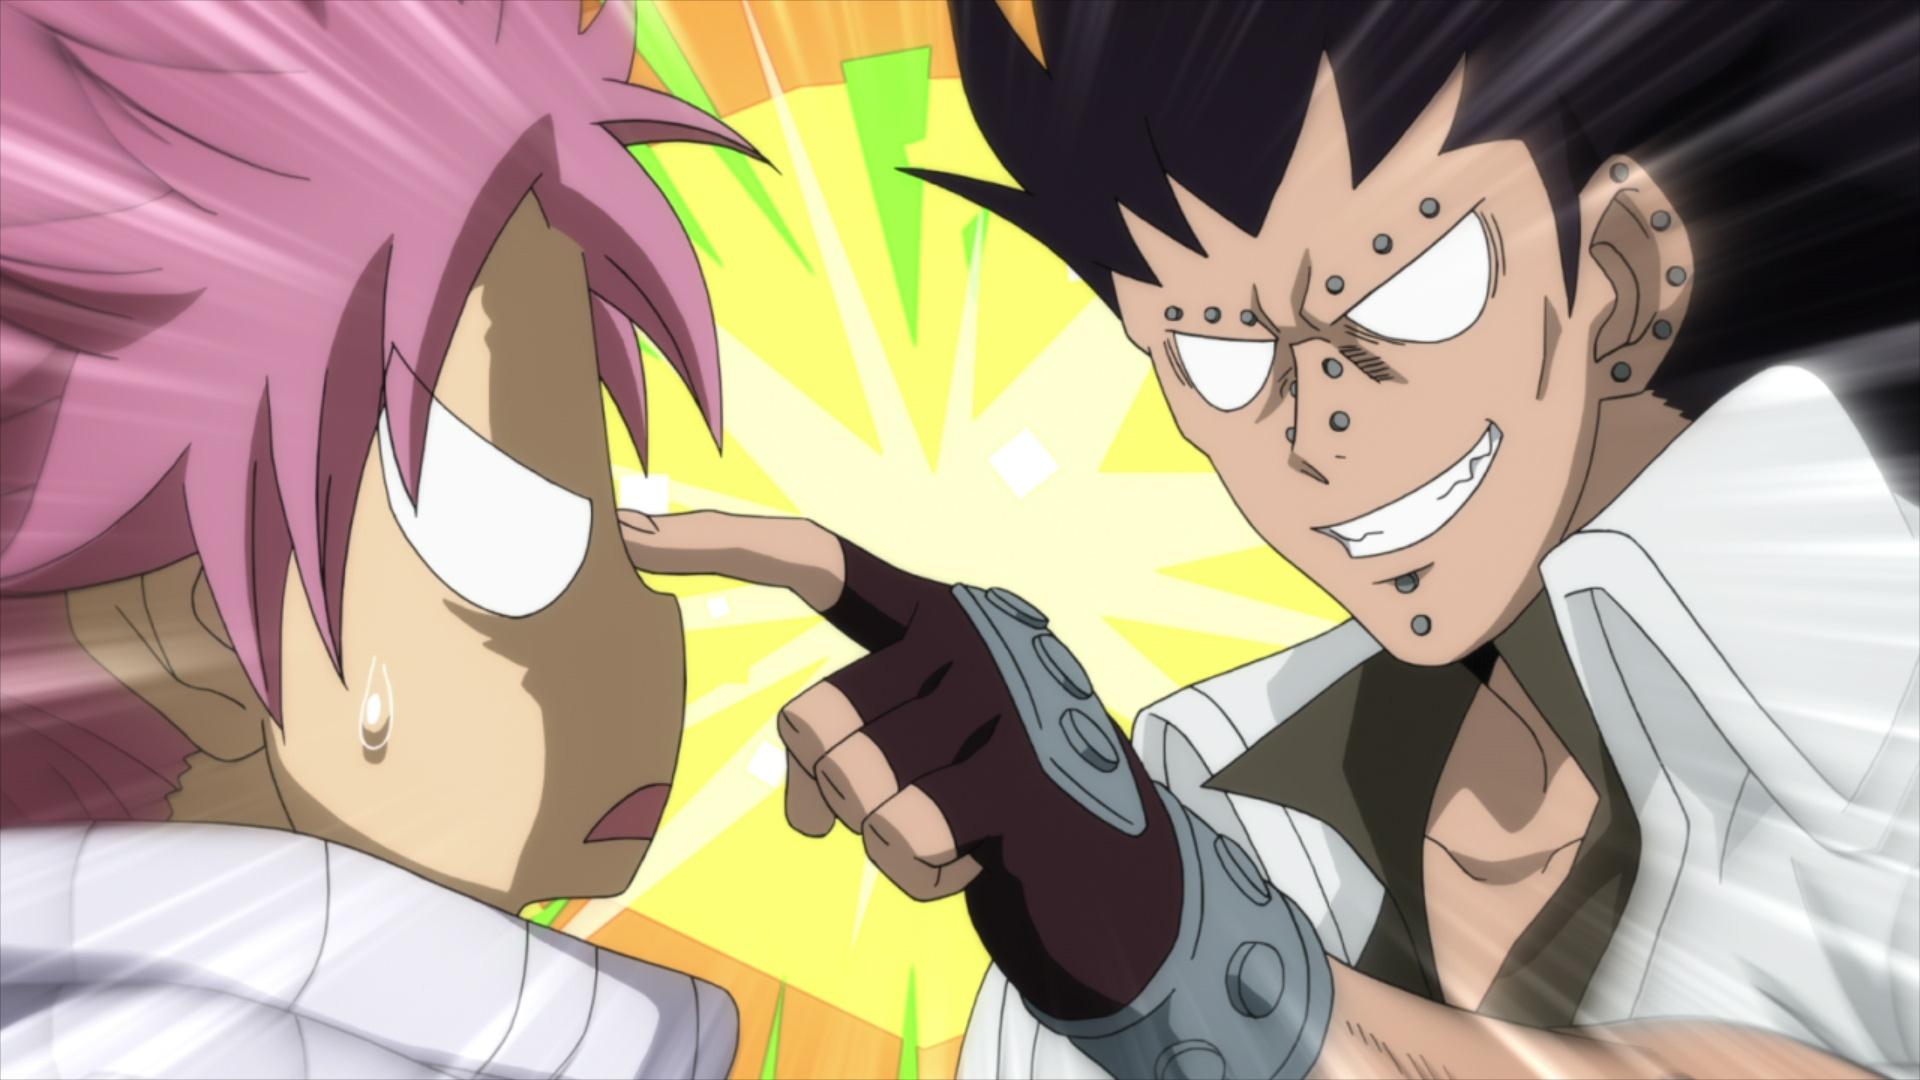 Watch Fairy Tail Season 9 Episode 283 Sub & Dub | Anime